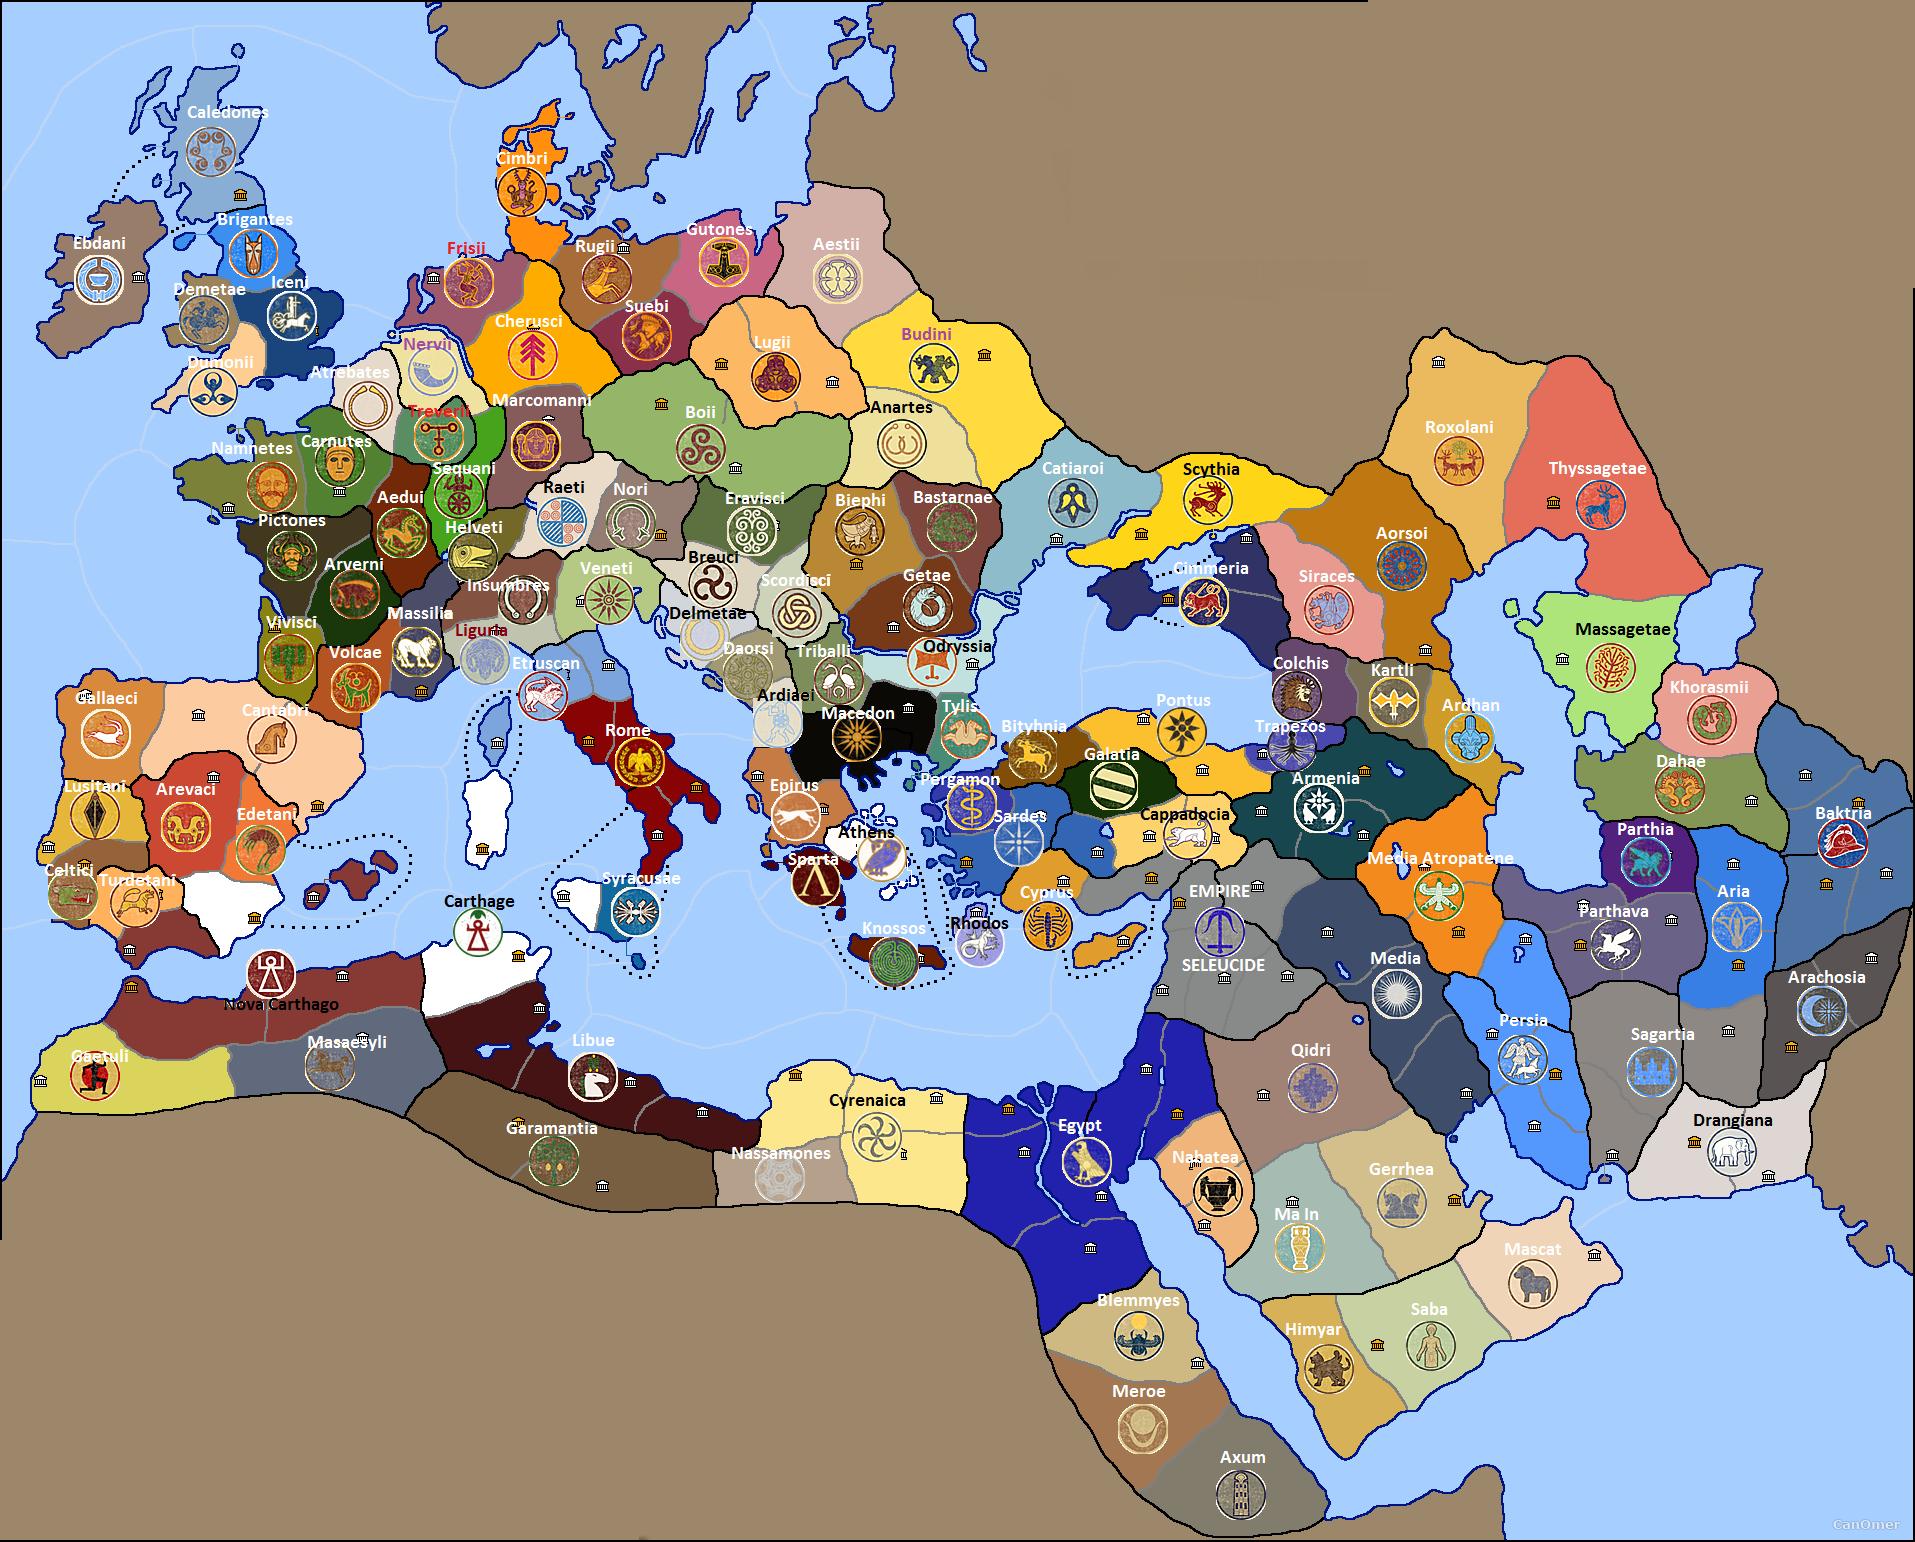 rome total war 2 map - Google Search   Random Pics ...